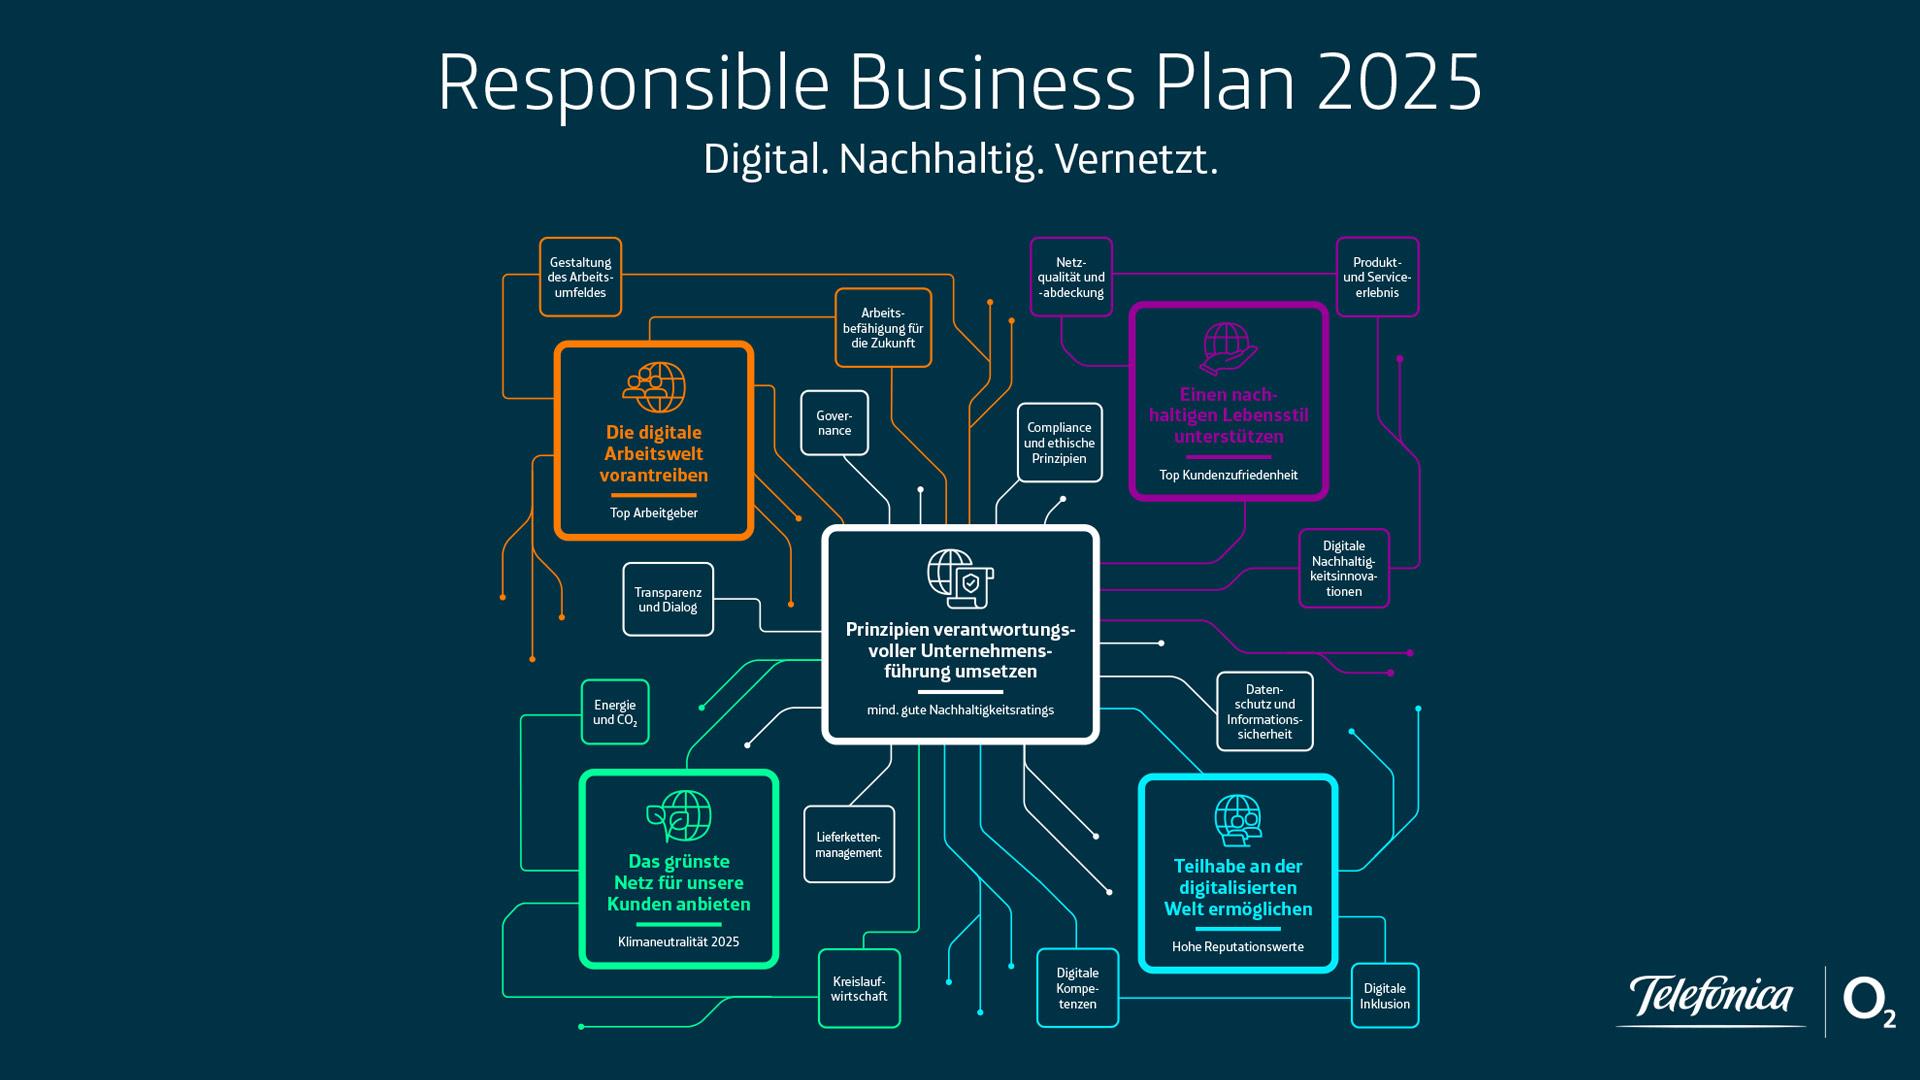 Telefonica-Deutschland-Responsible-Business-Plan-RBP-2025-komplett-1920x1080